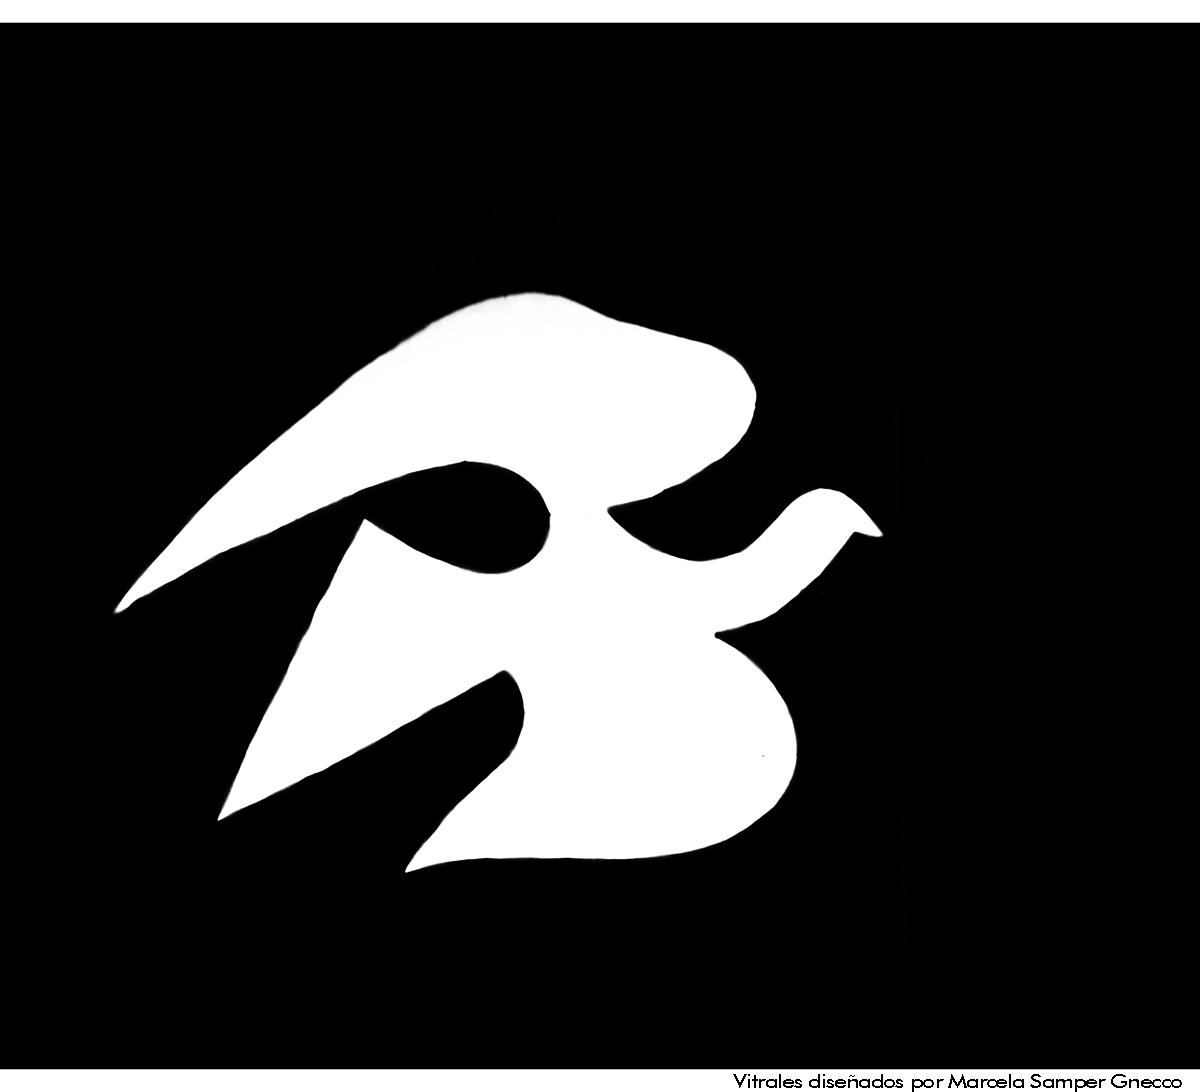 simbolo_del_espiritu_santo-x.jpg